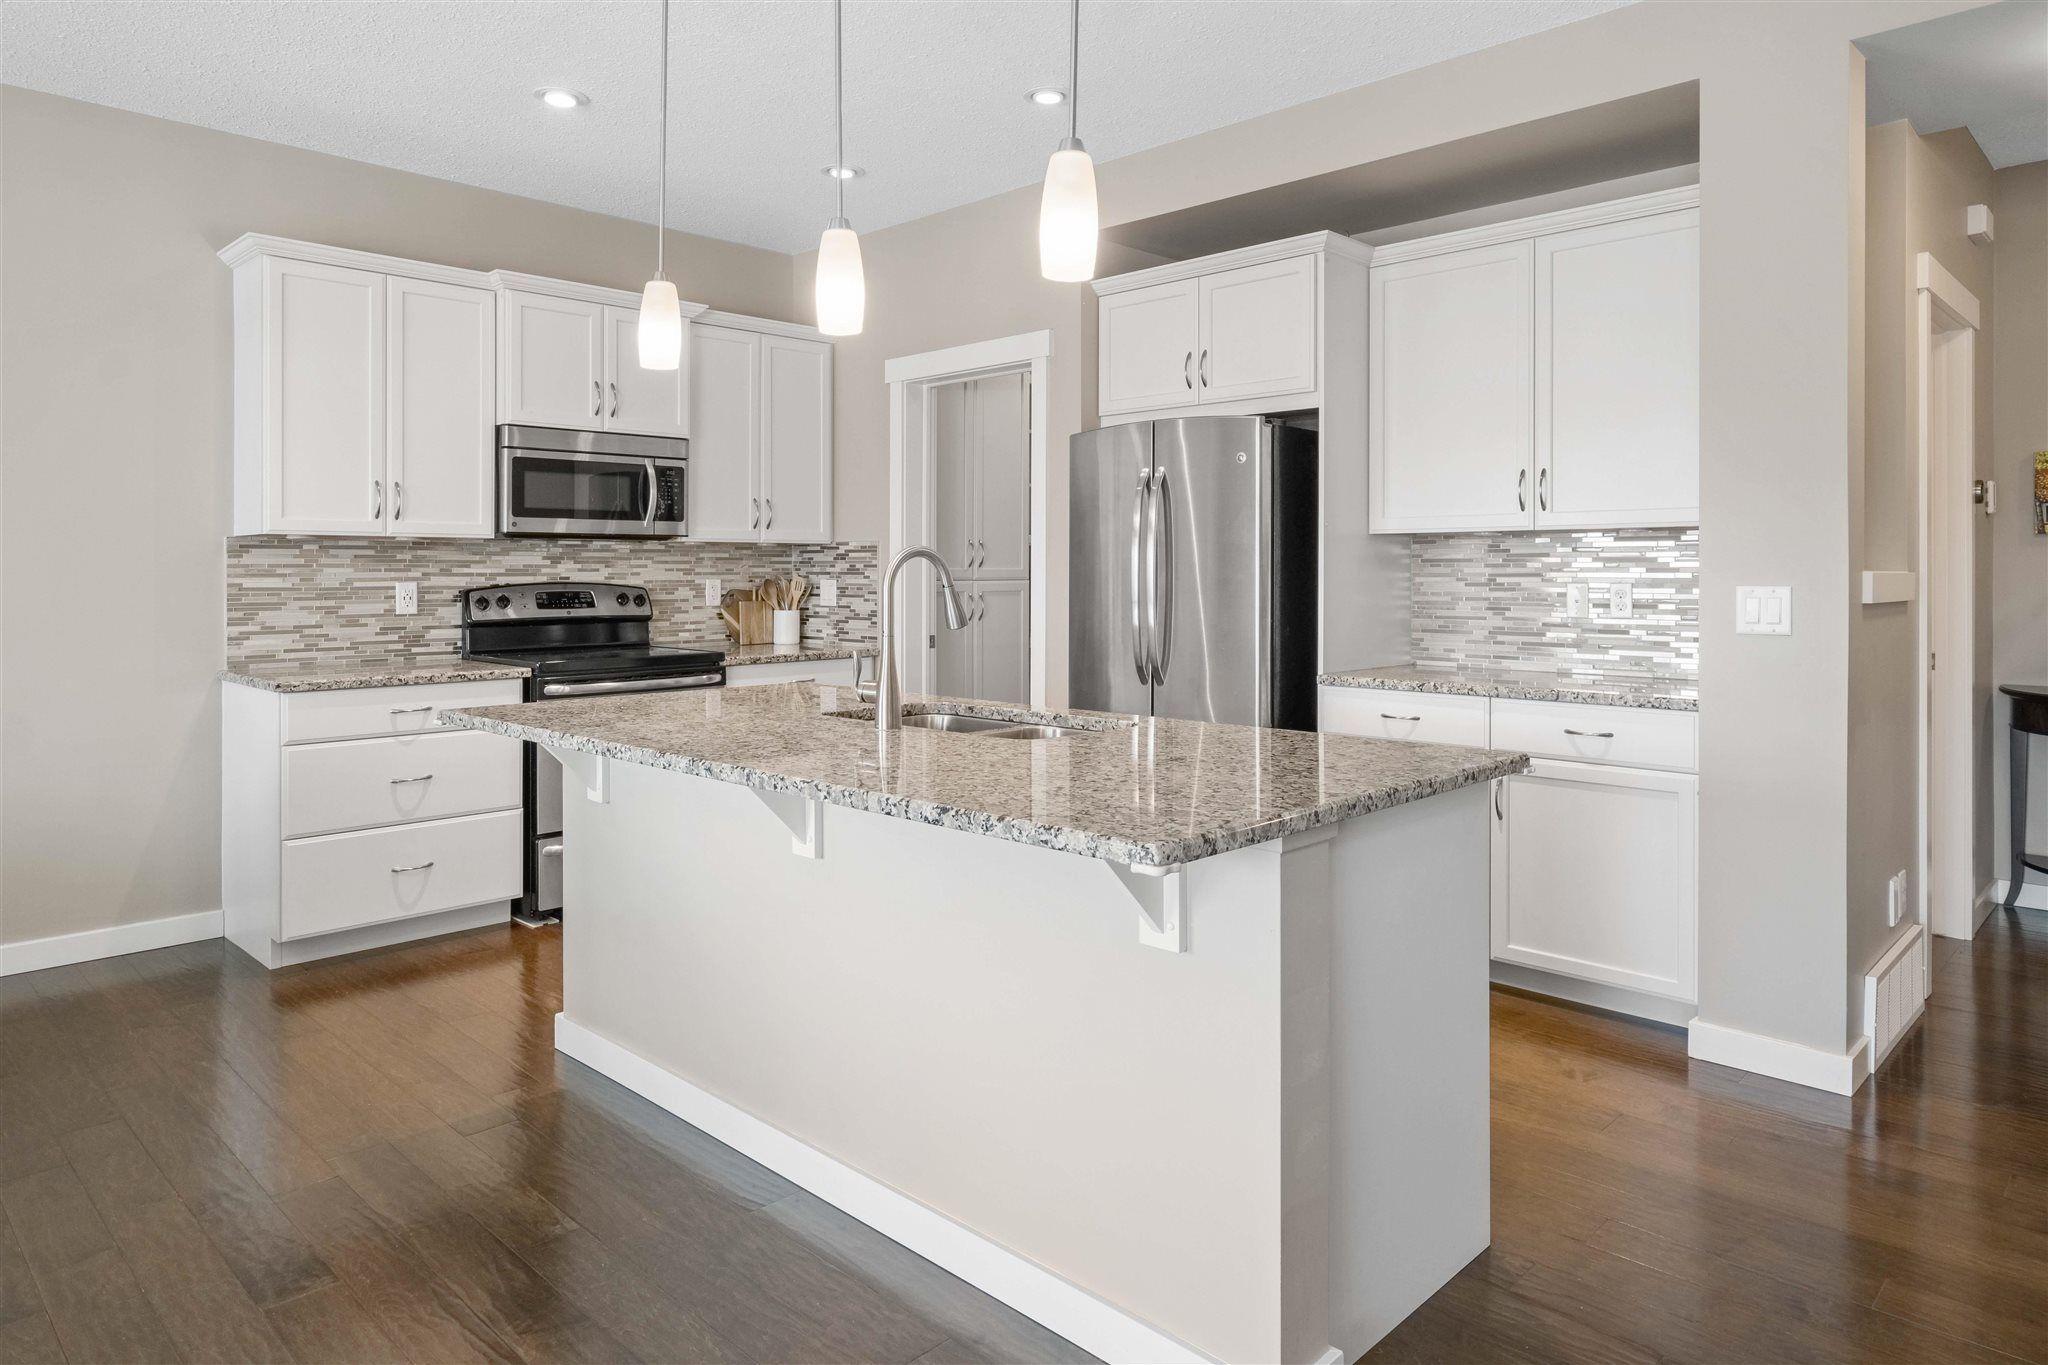 Main Photo: 5025 DEWOLF Road in Edmonton: Zone 27 House for sale : MLS®# E4245611